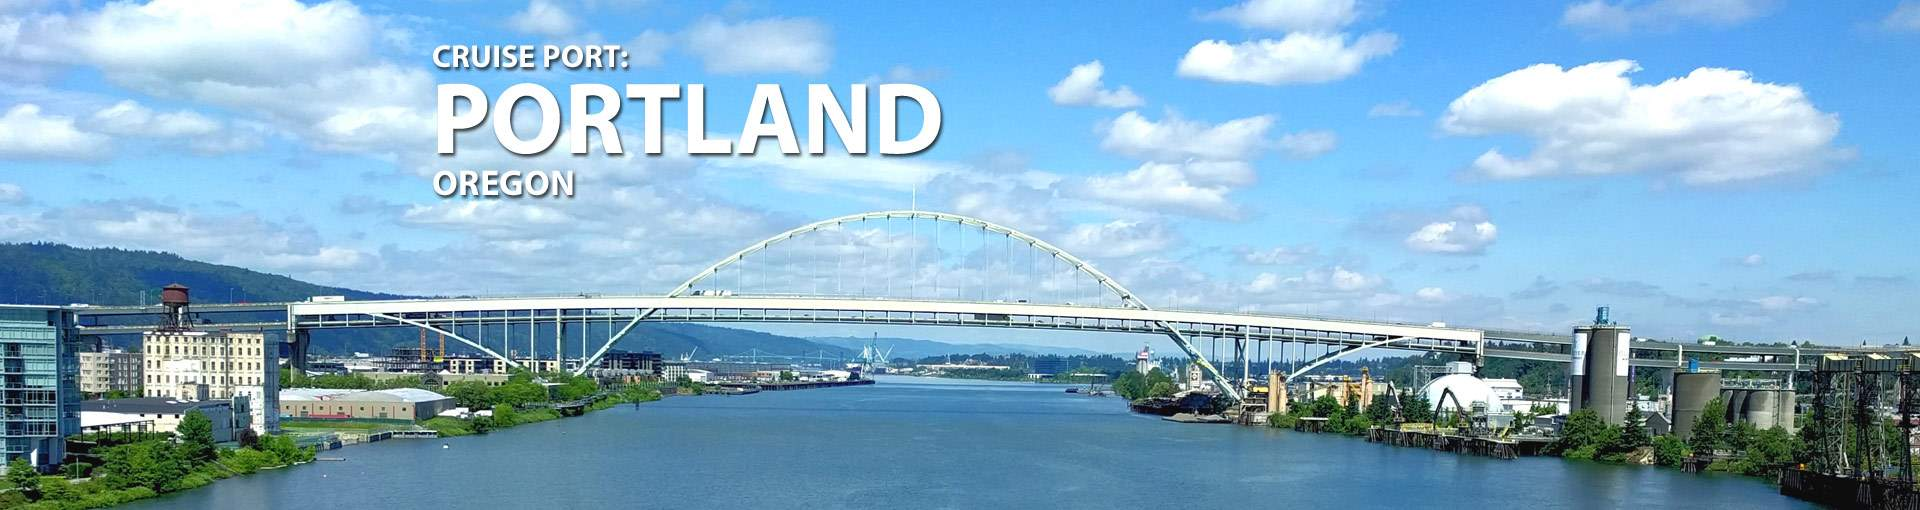 Portland, Oregon Cruise Port